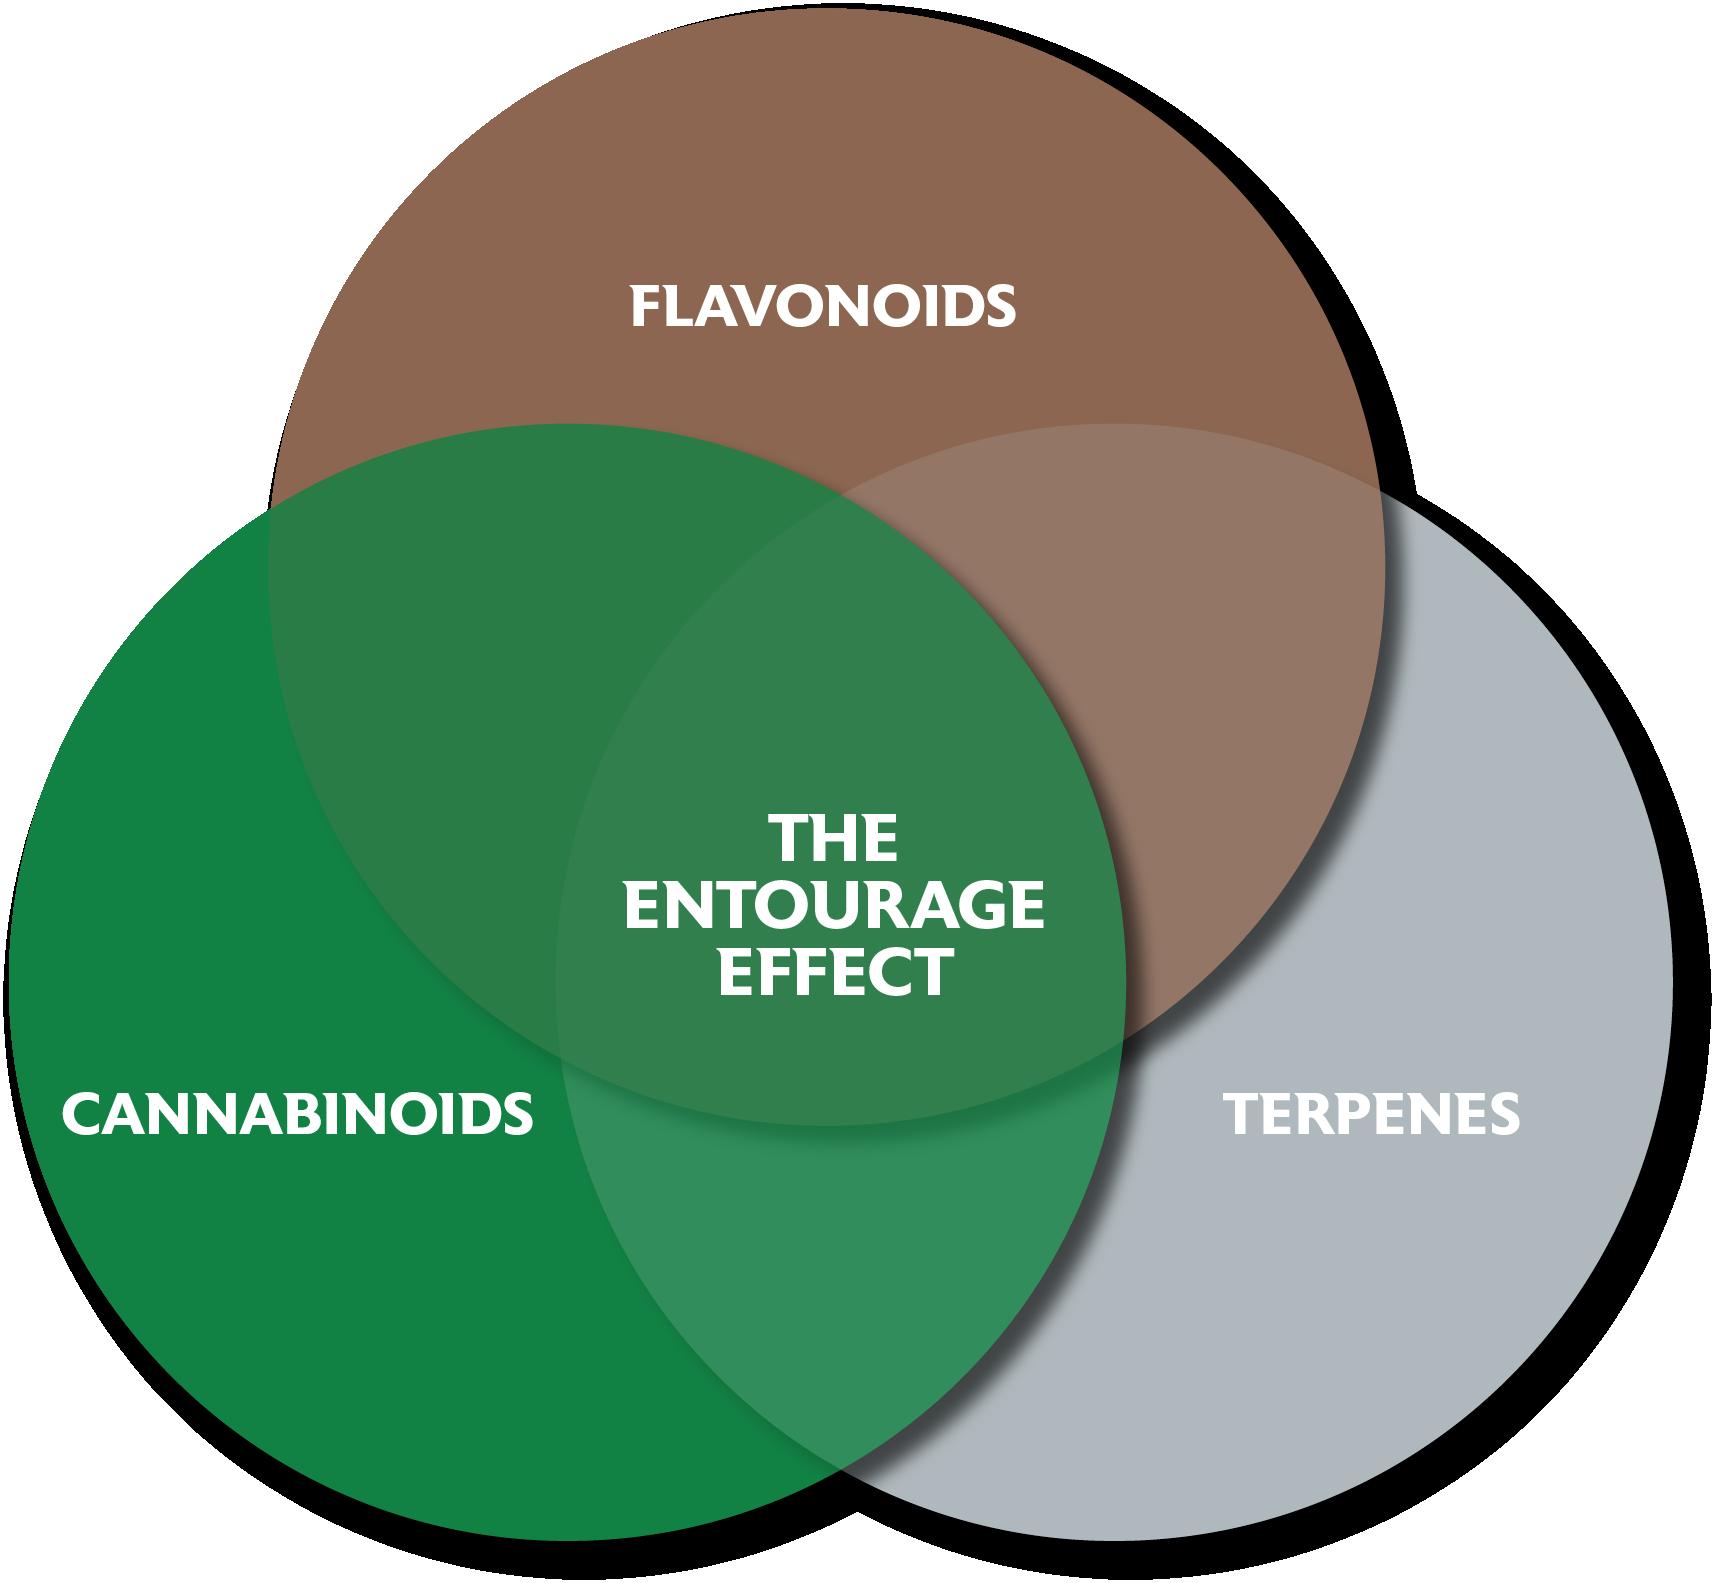 The Entourage Effect - Flavonoids, Cannabinoids, Terpenes